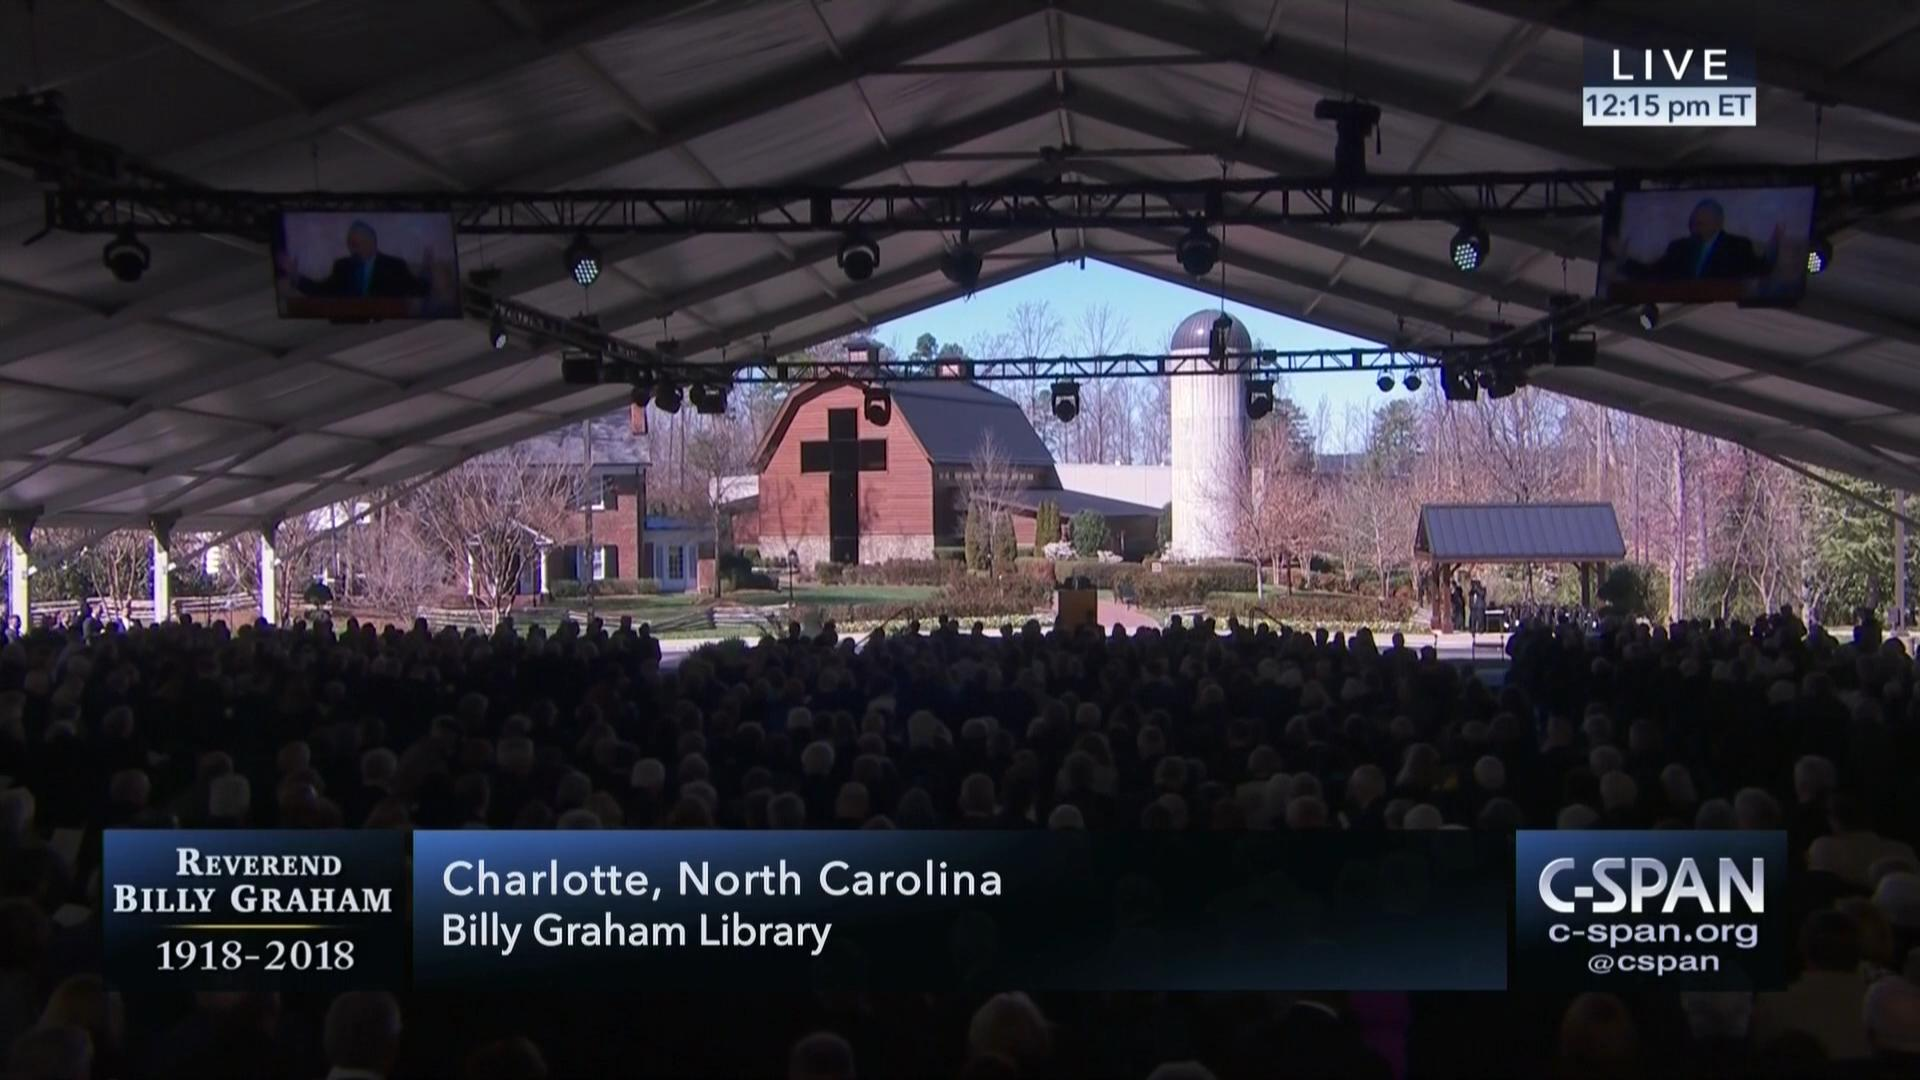 Reverend Billy Graham Funeral Service